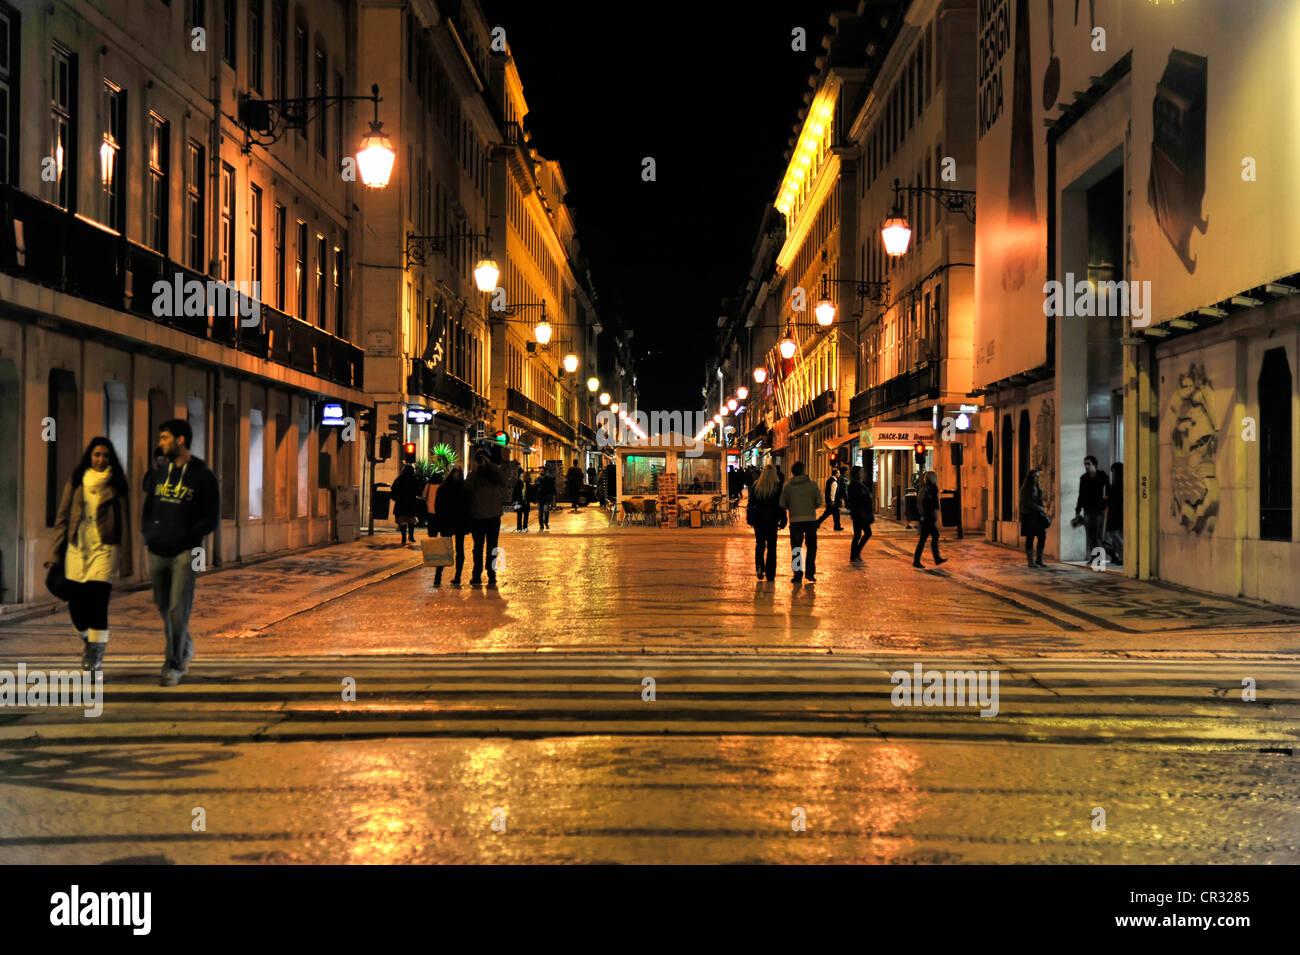 Rua Augusta, Baixa Chiado, Lisbon, Portugal, Europe Stock Photo